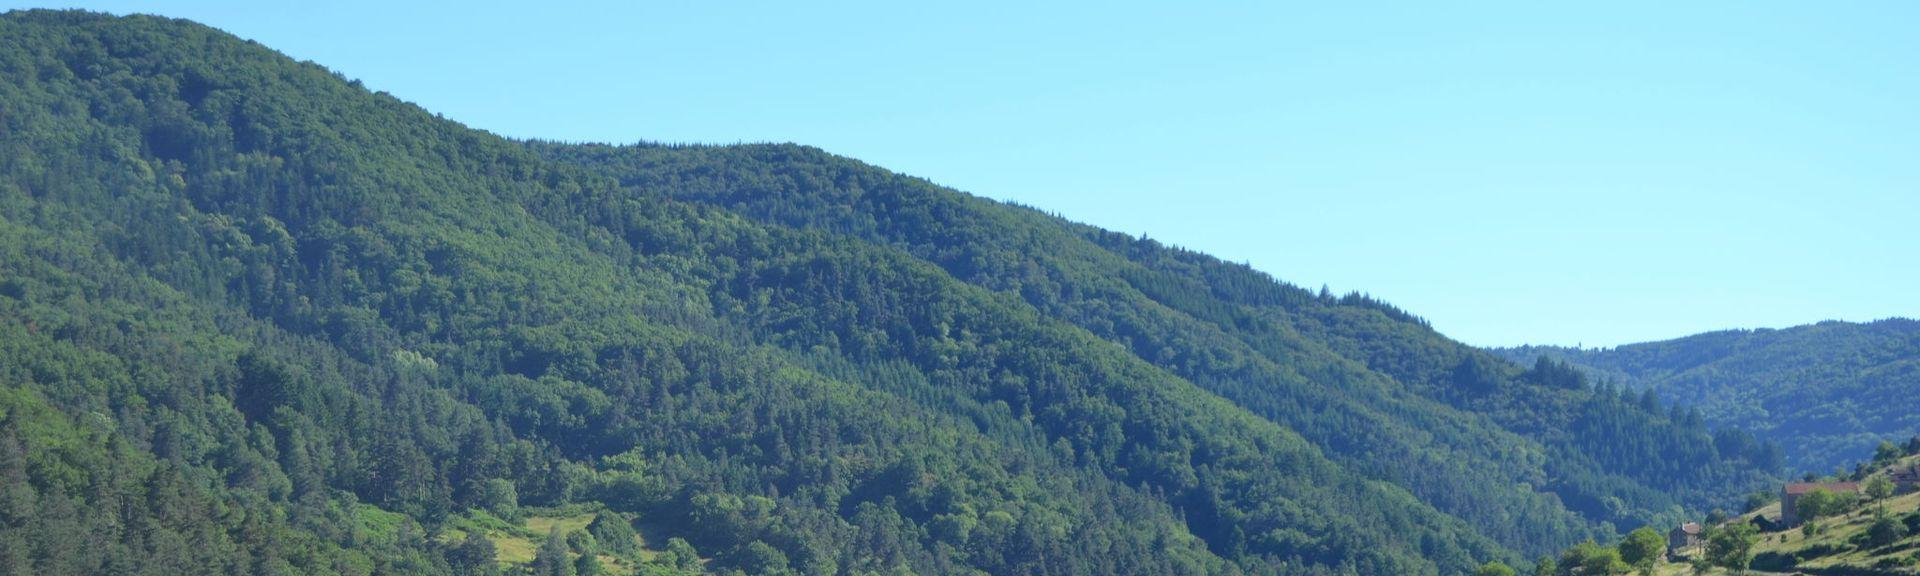 Langeac, Auvergne-Rhône-Alpes, Francja